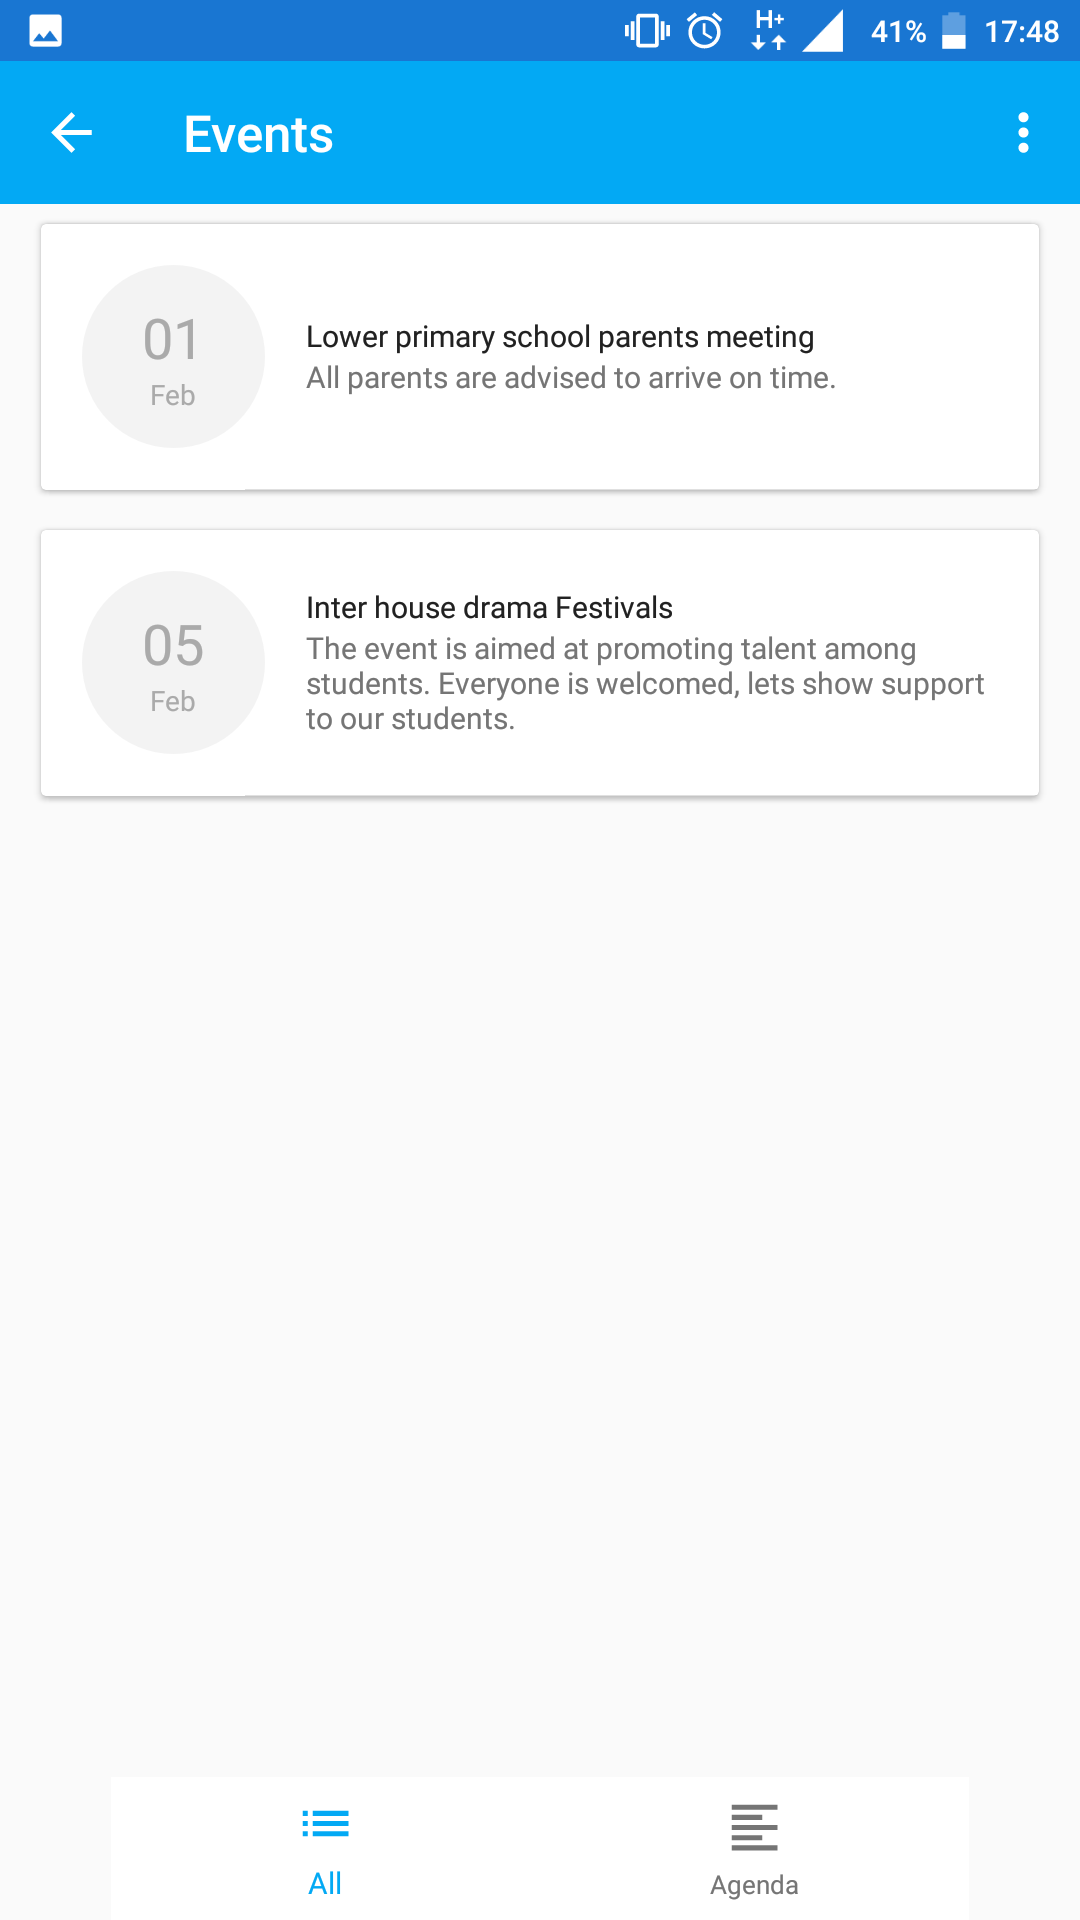 Bunifu Schools Mobile App - Events Listing